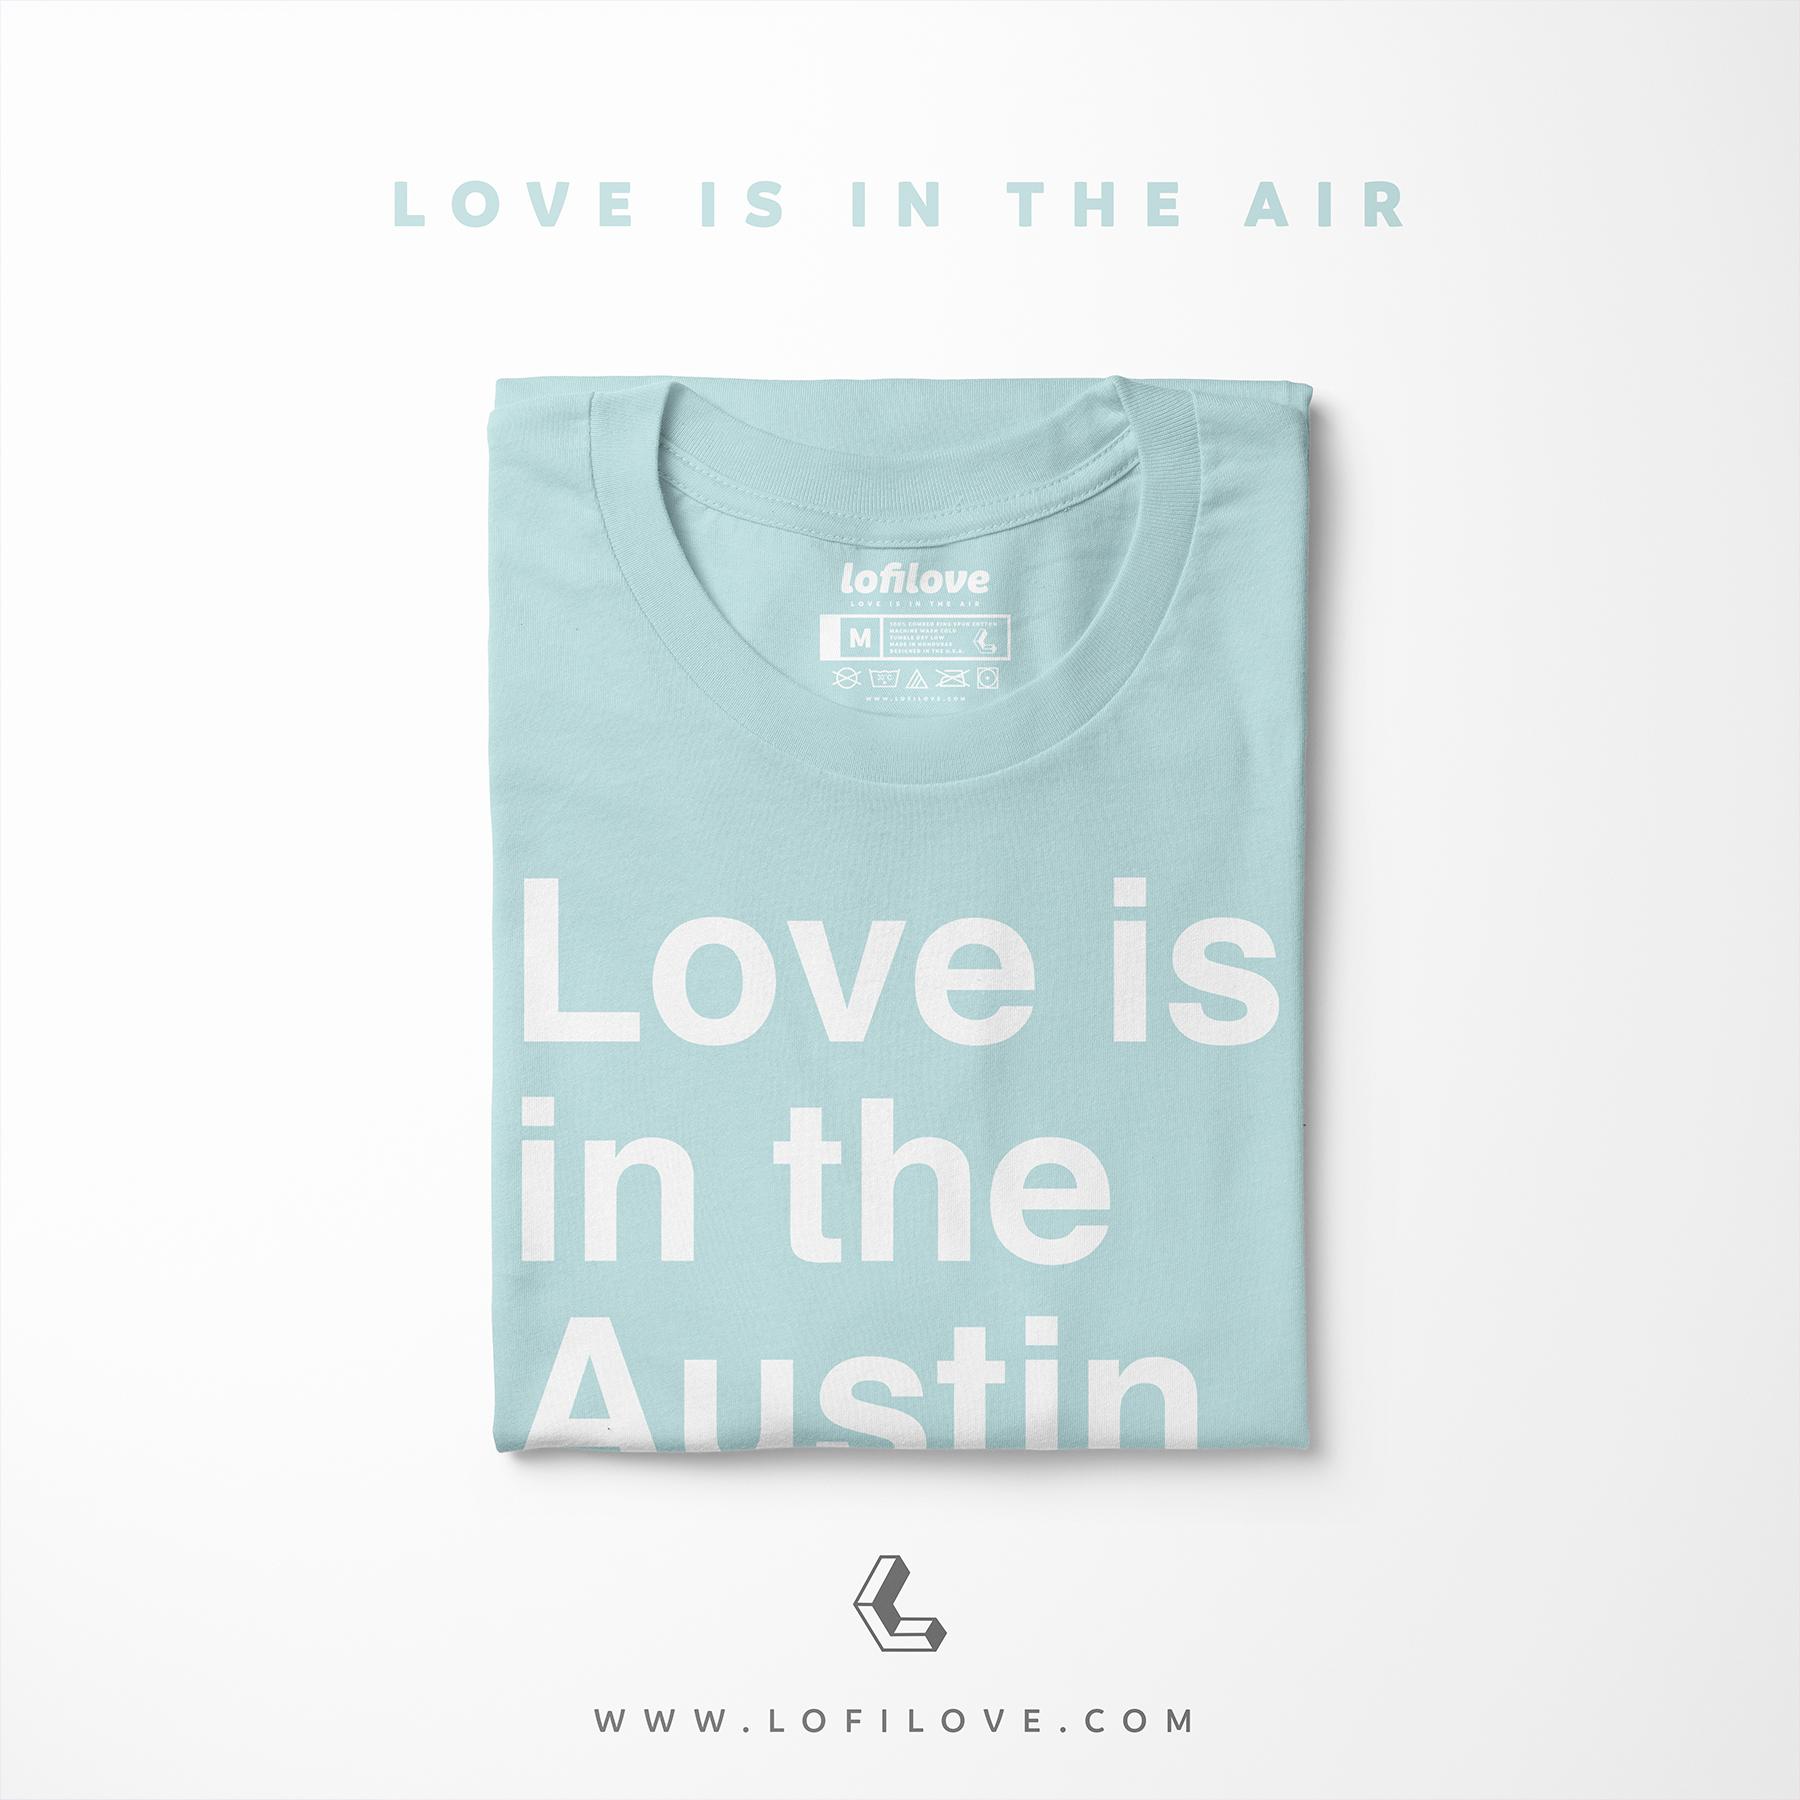 lofilove-love-is-in-the-air-tee-2